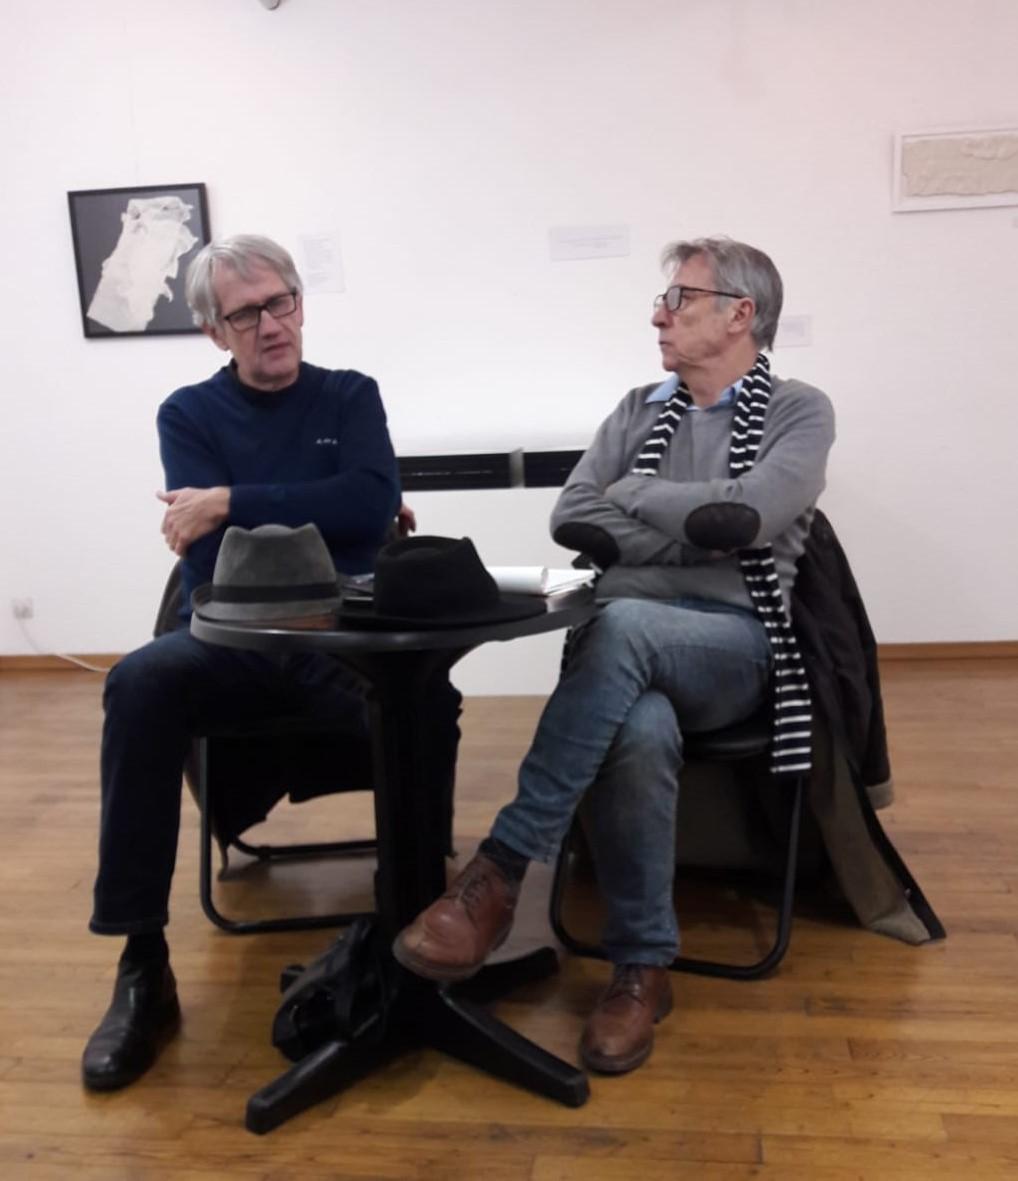 14/12/2018, Librairie Torcatis, Perpignan (avec Hyacinthe Carrera)